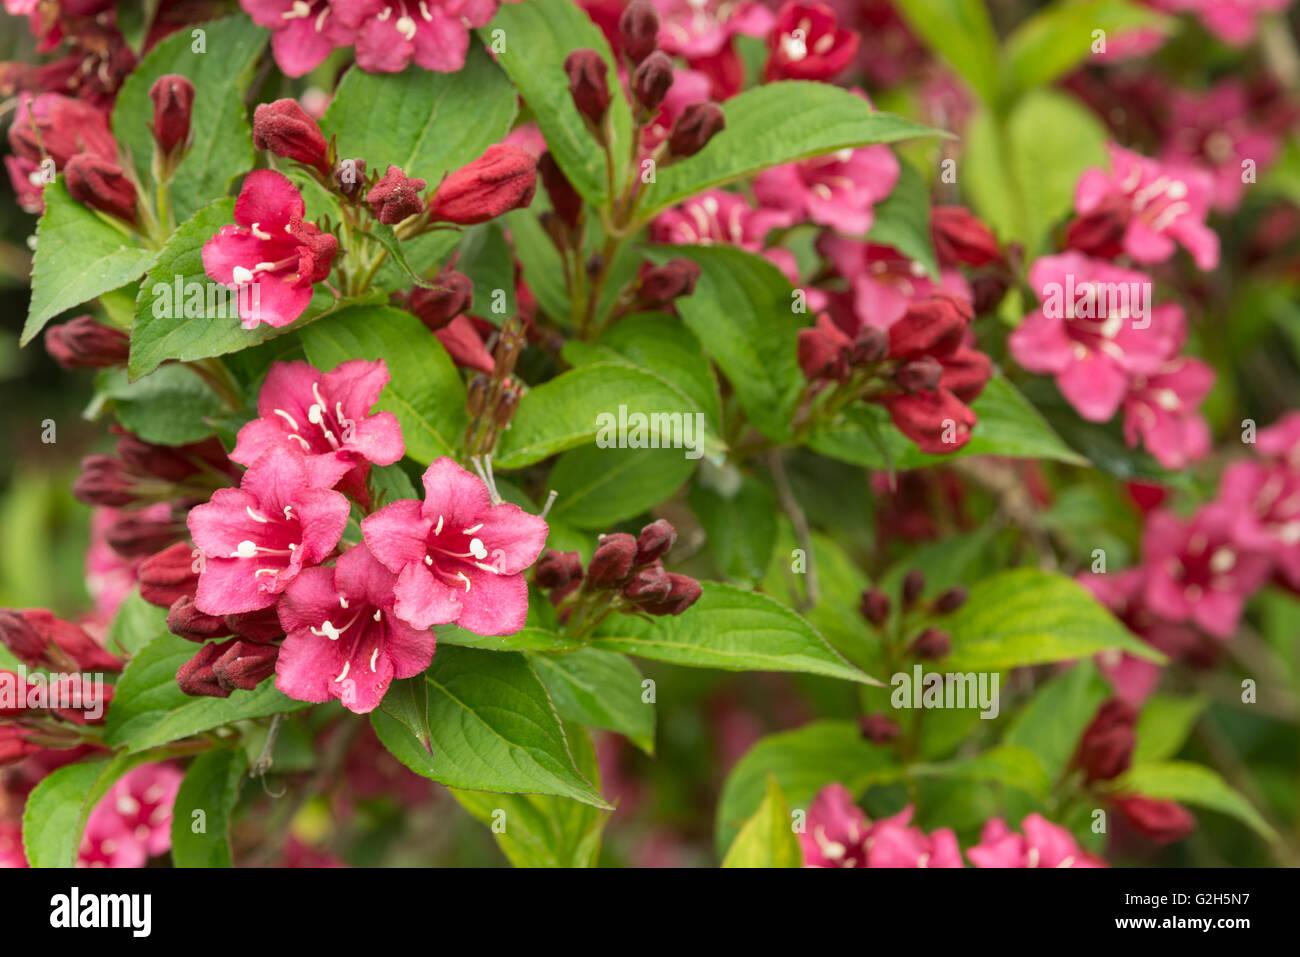 Masses of summer flowers to weigela florida pink princess stock masses of summer flowers to weigela florida pink princess mightylinksfo